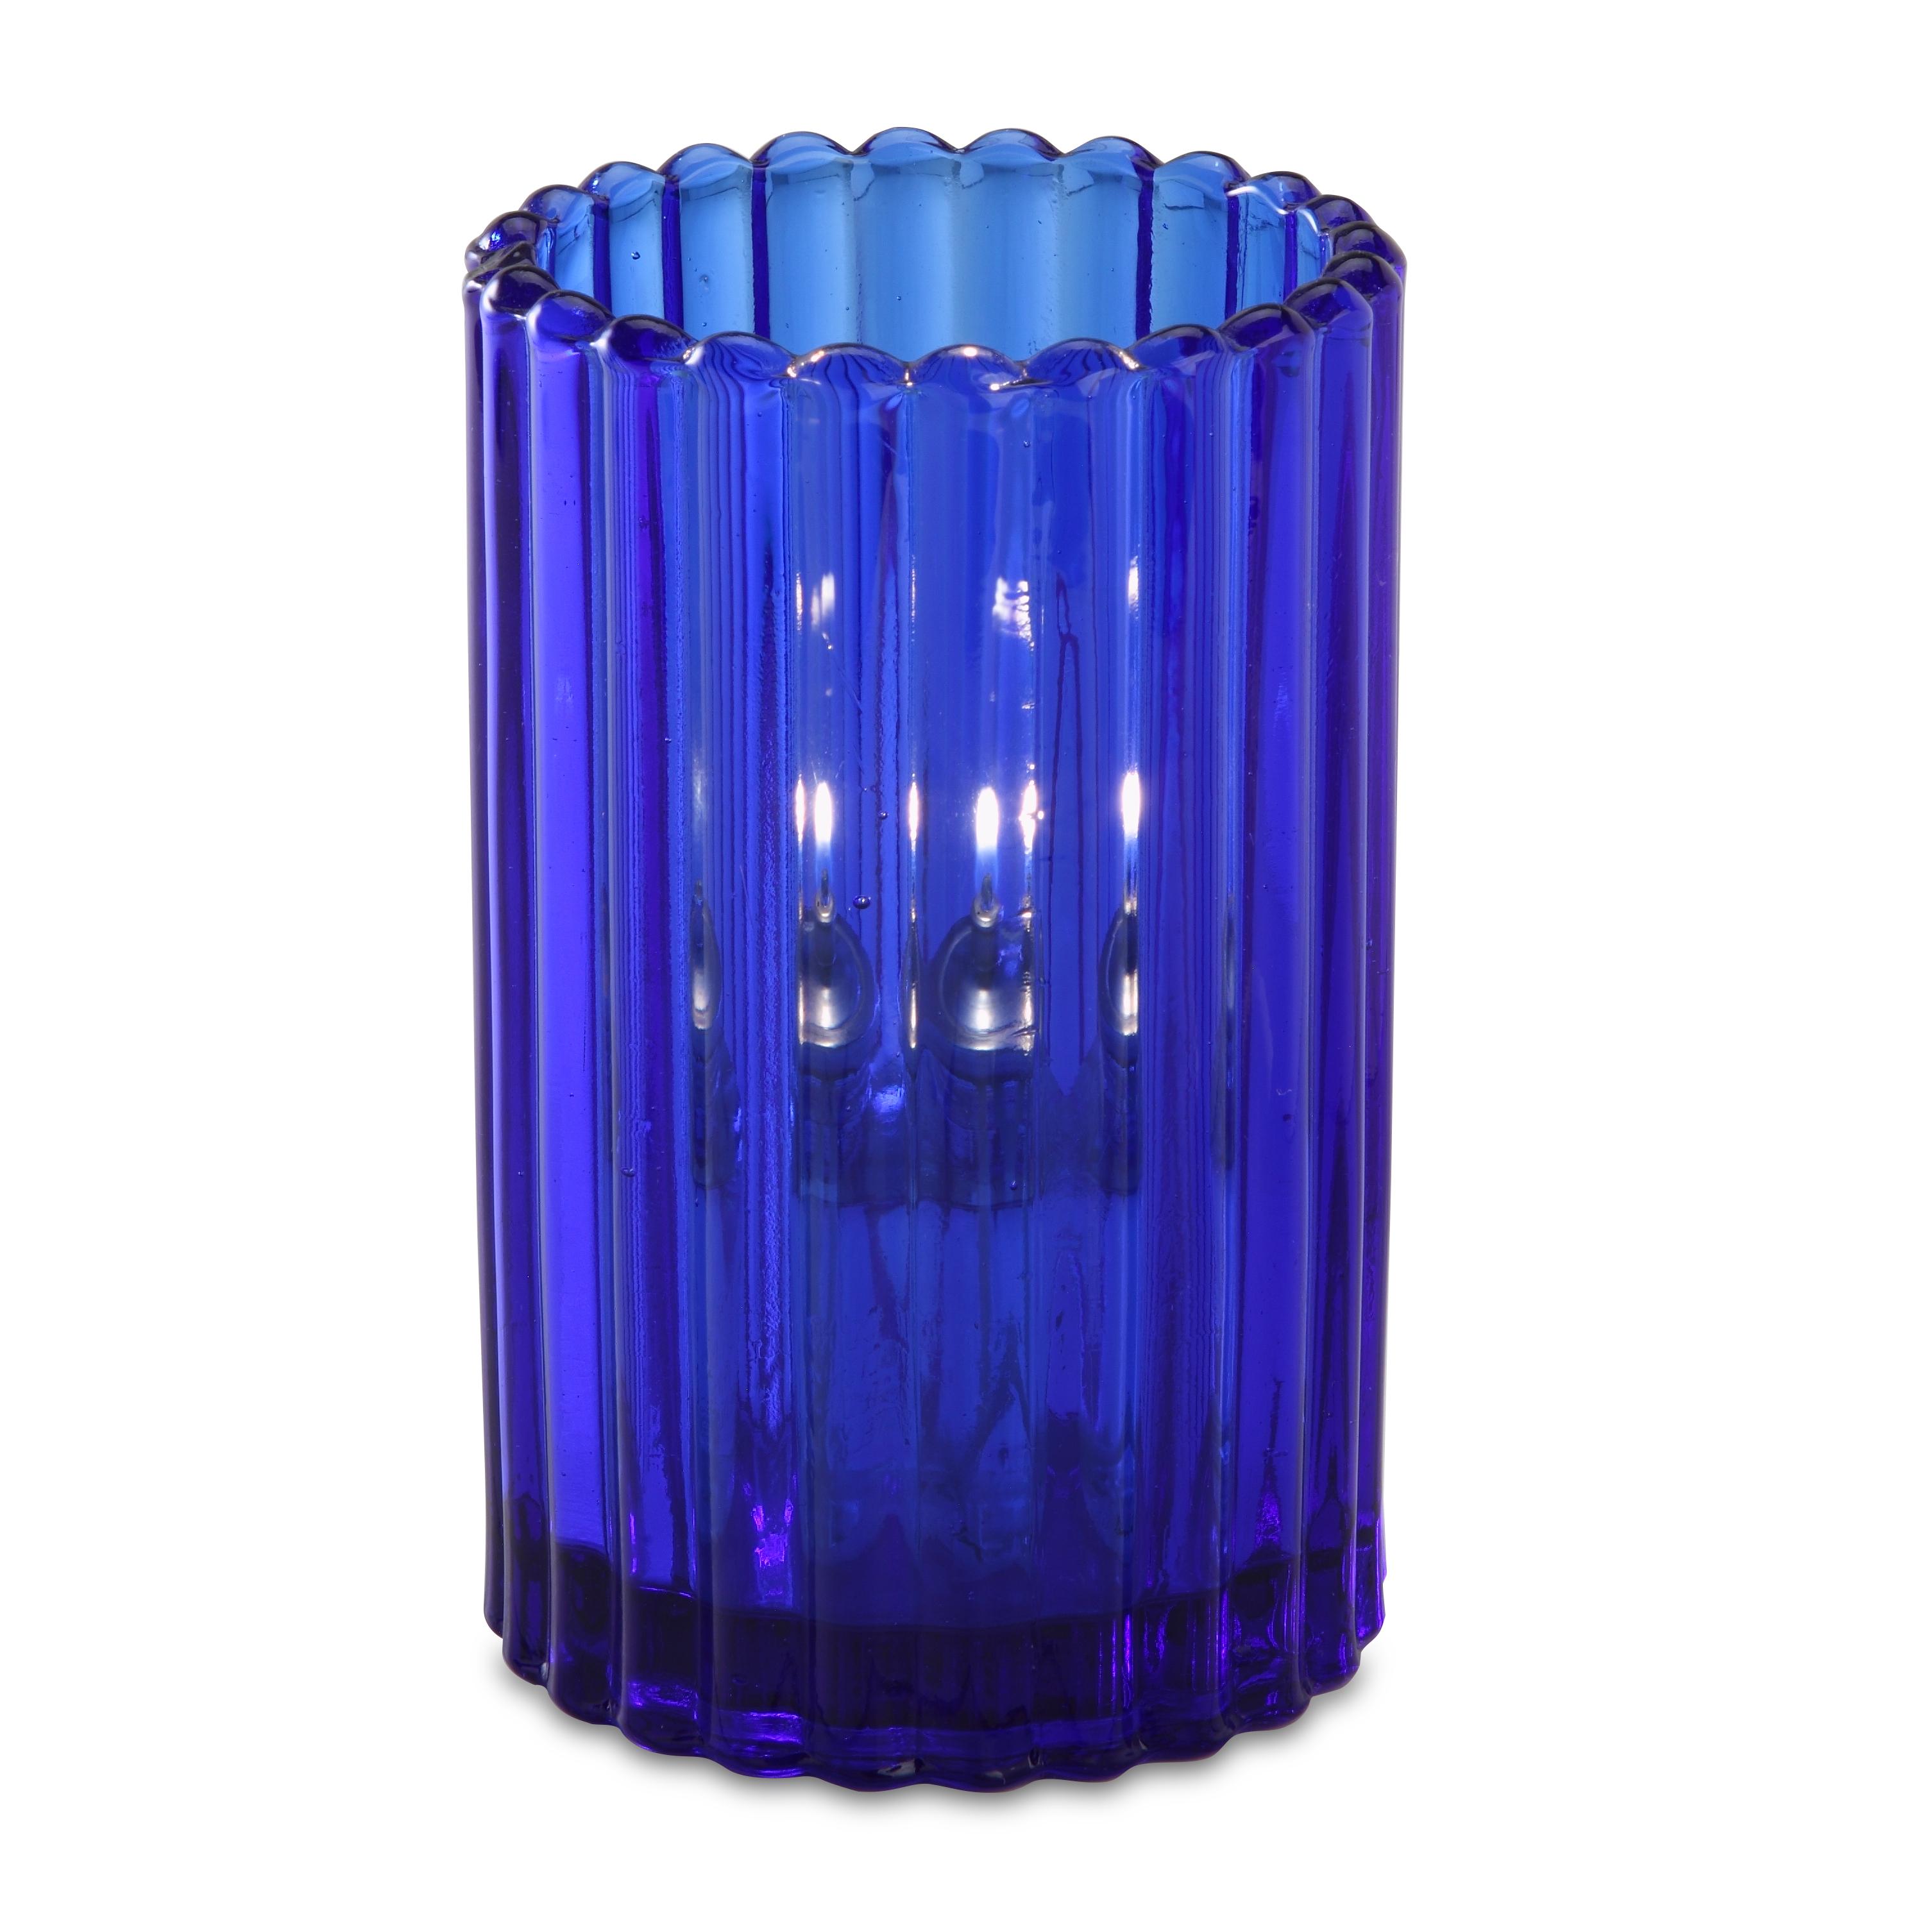 Sterno 80210 lamp